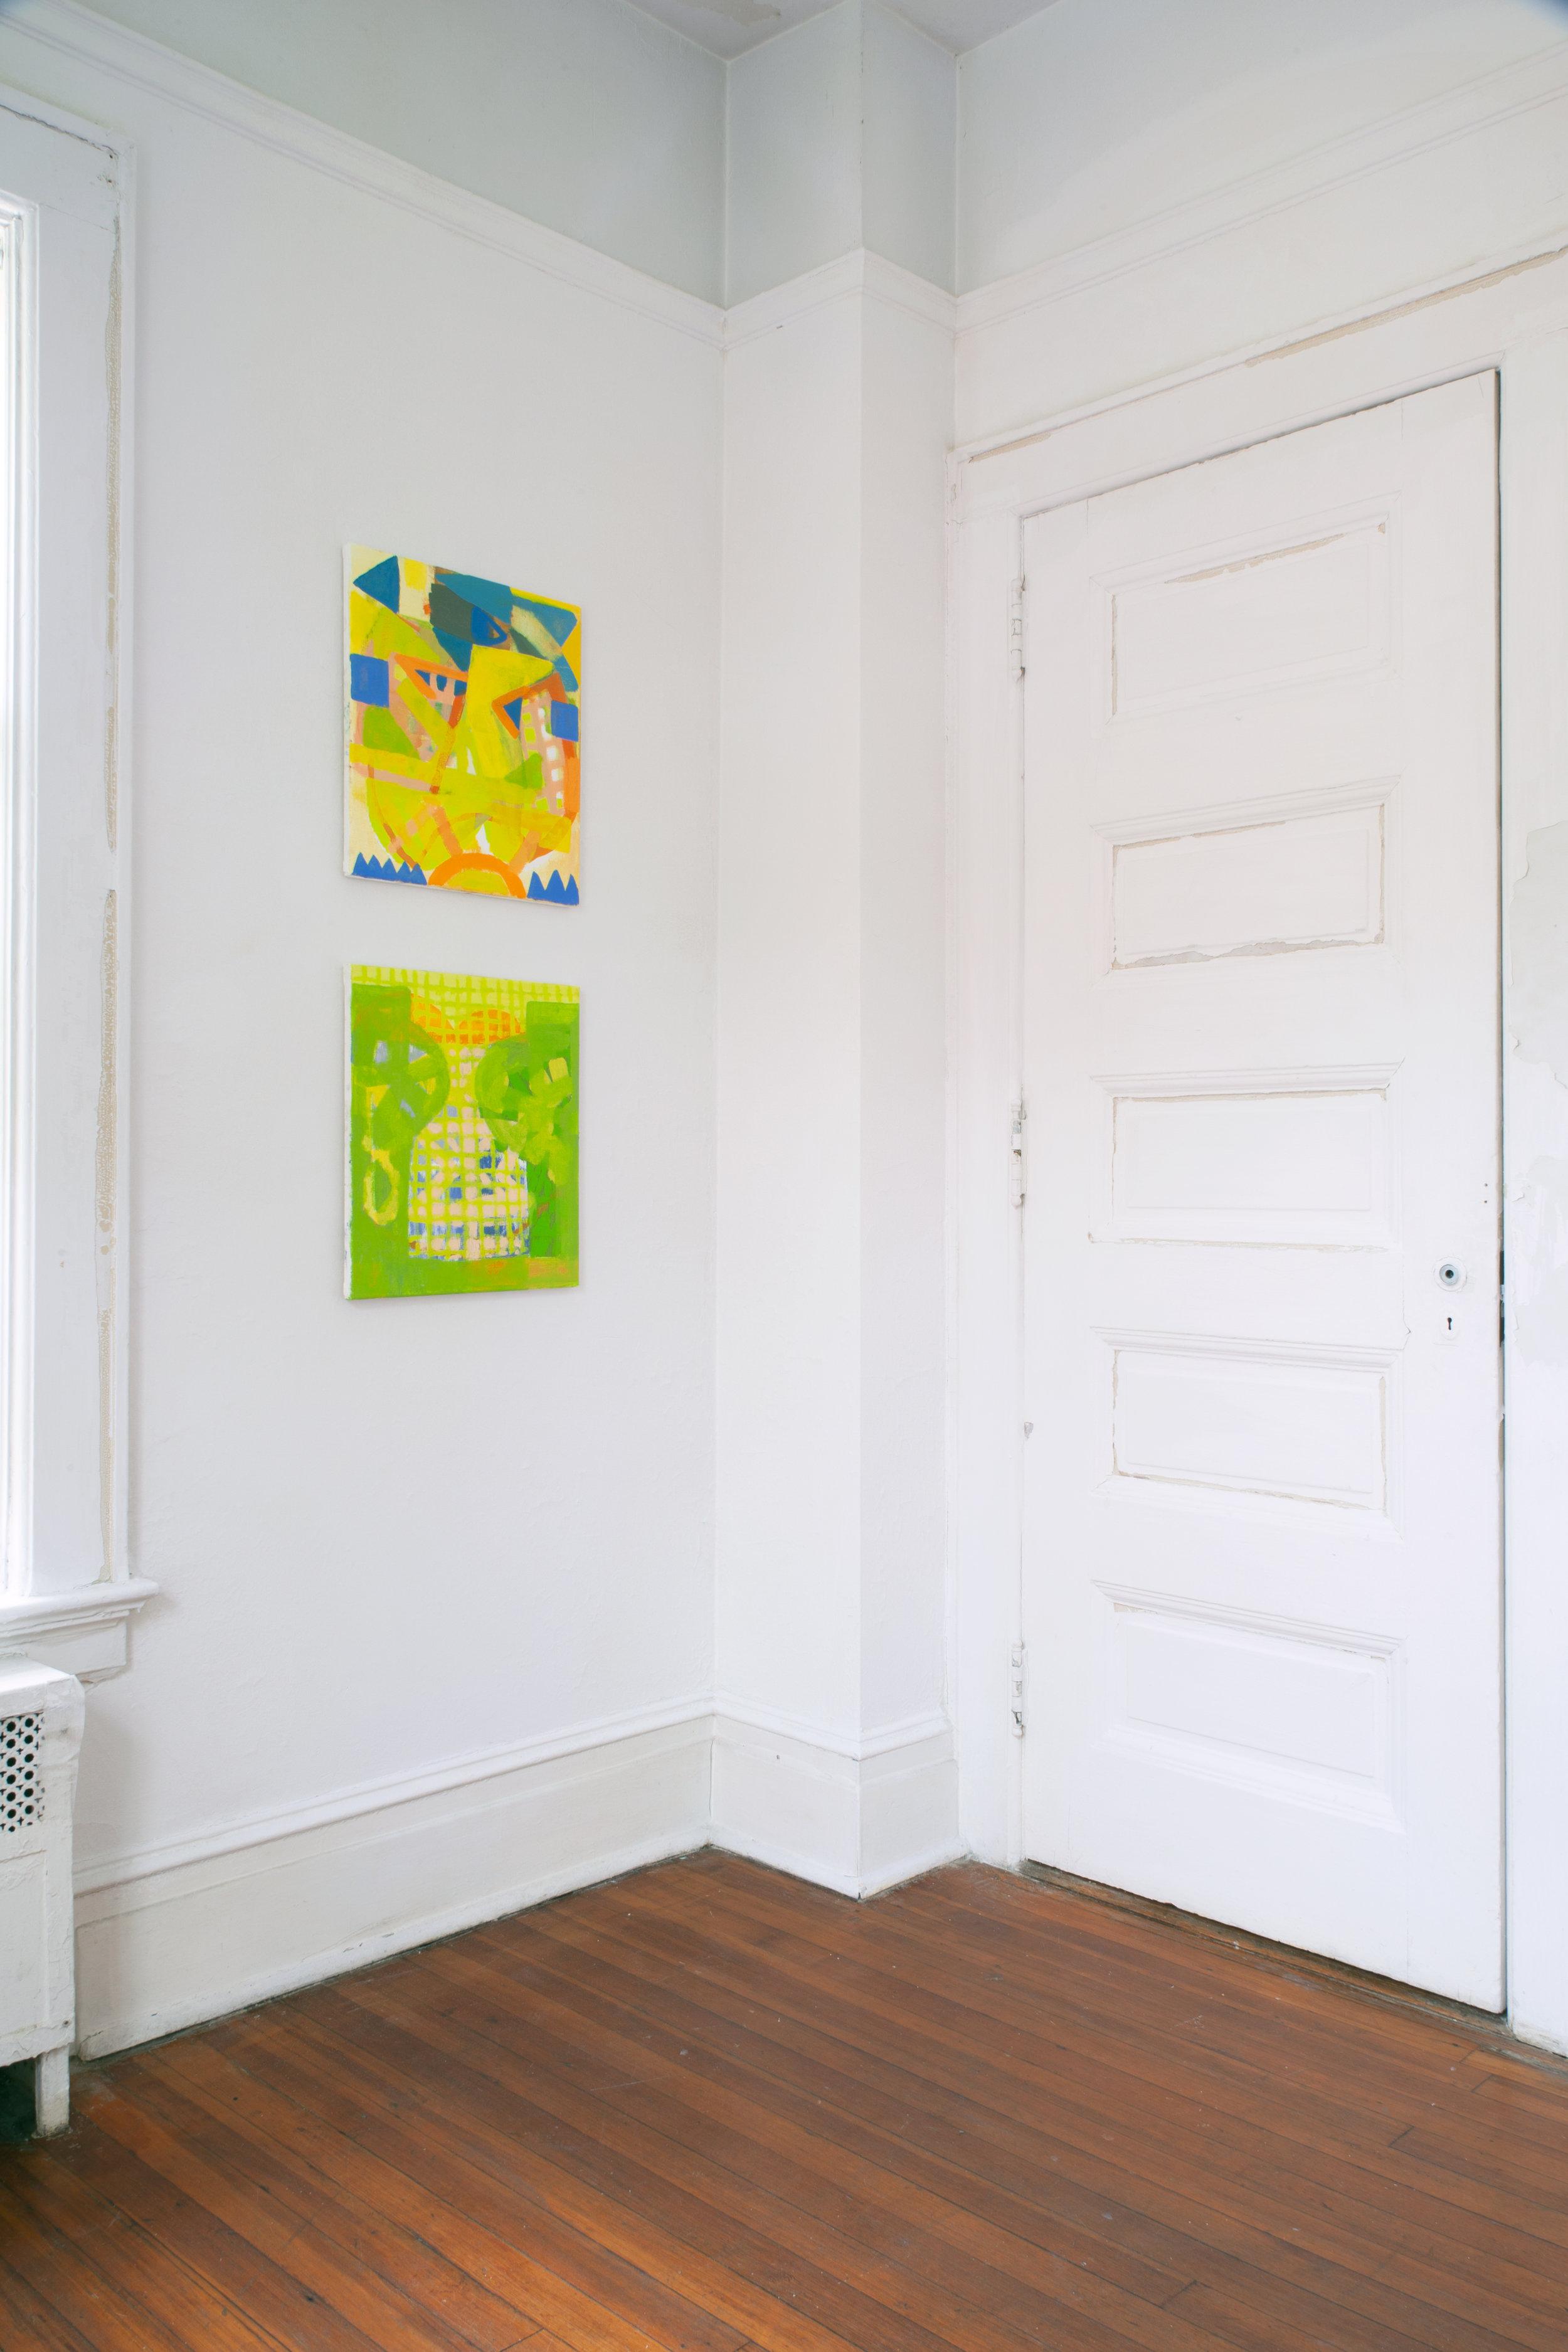 Meghan_Brady-NADA_House-2019-installation_view_10.jpg